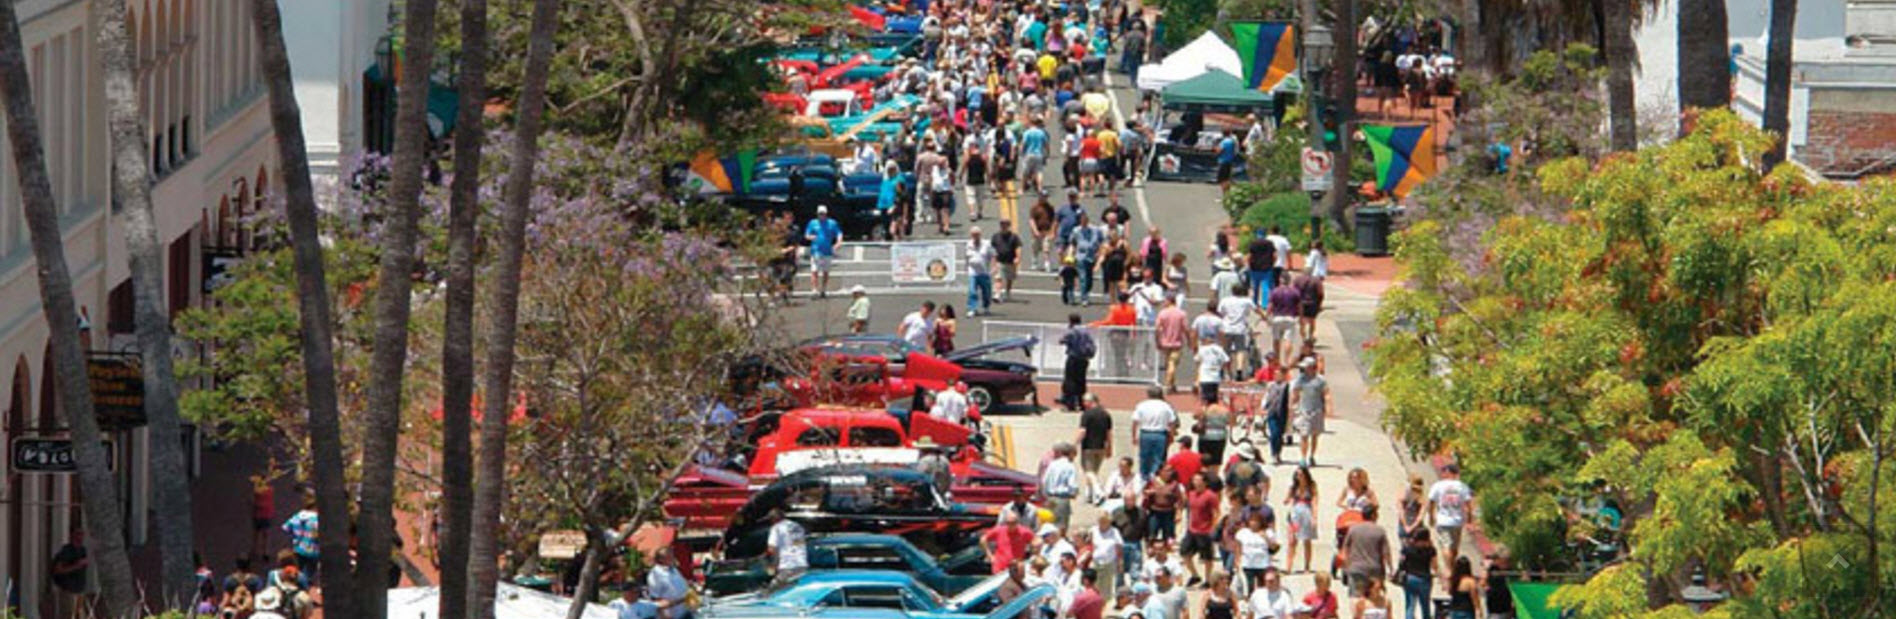 Santa Barbara State Street National Premier Car Show